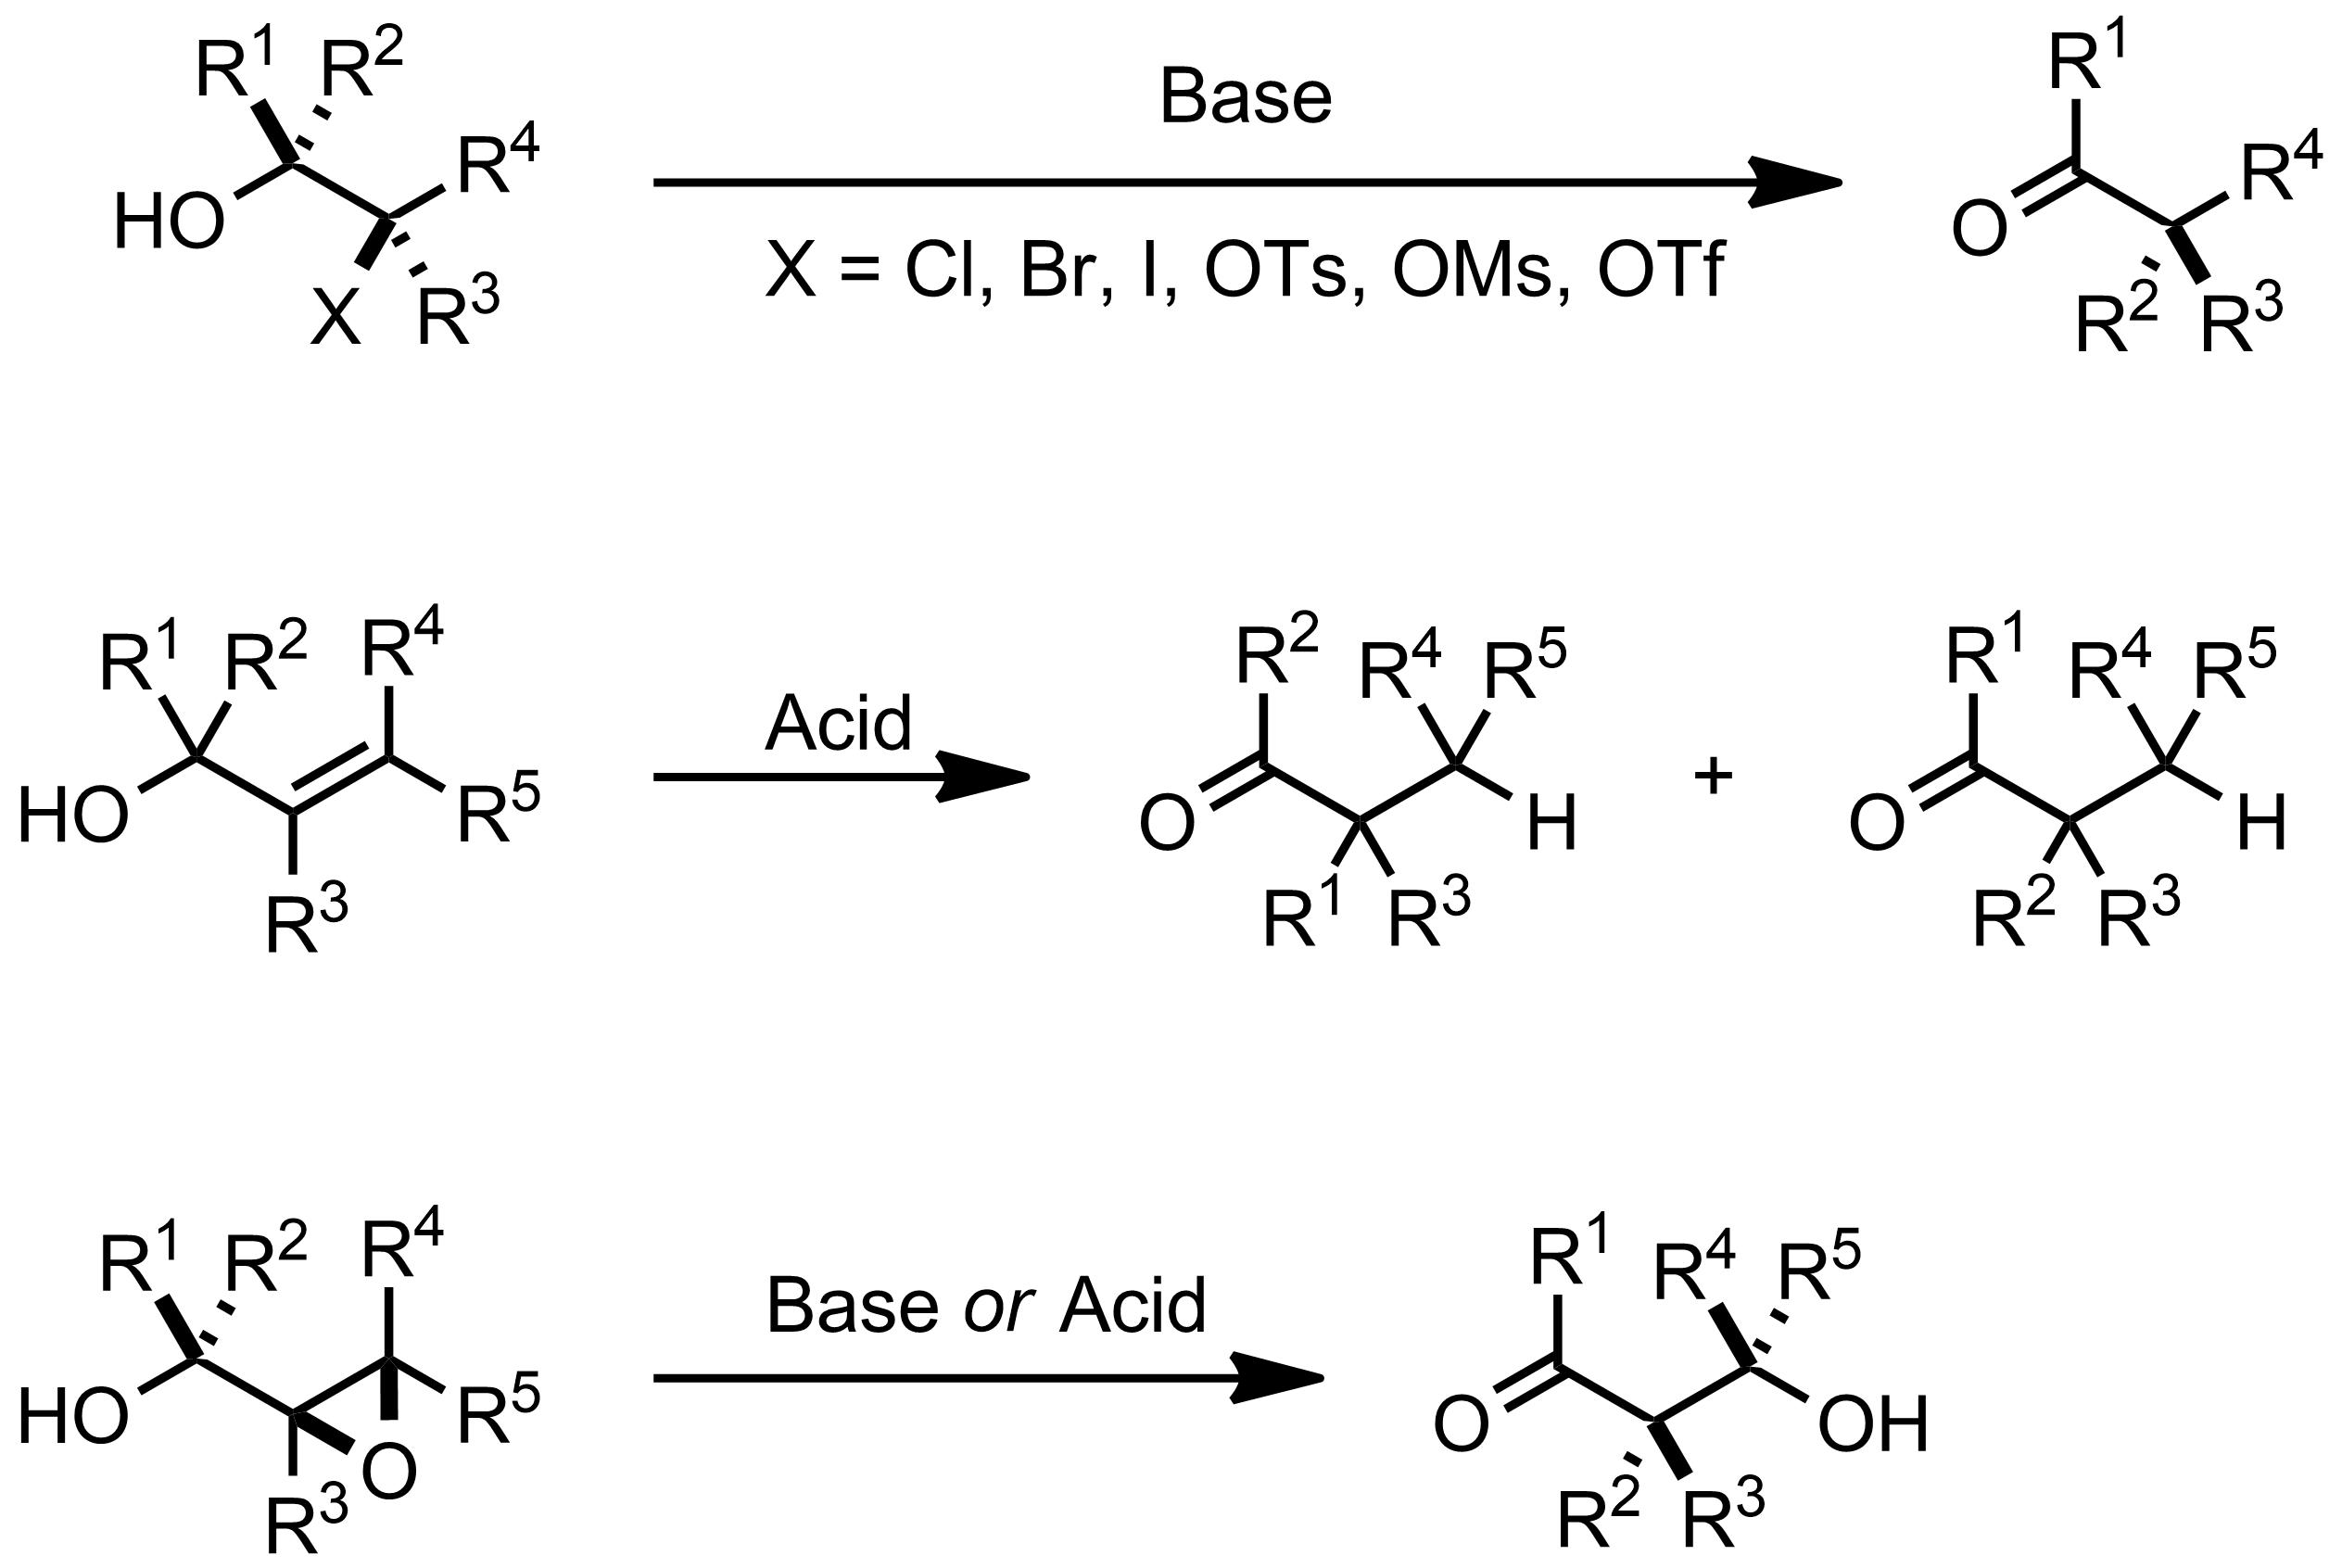 Schematic representation of the Semi-Pinacol Rearrangement.